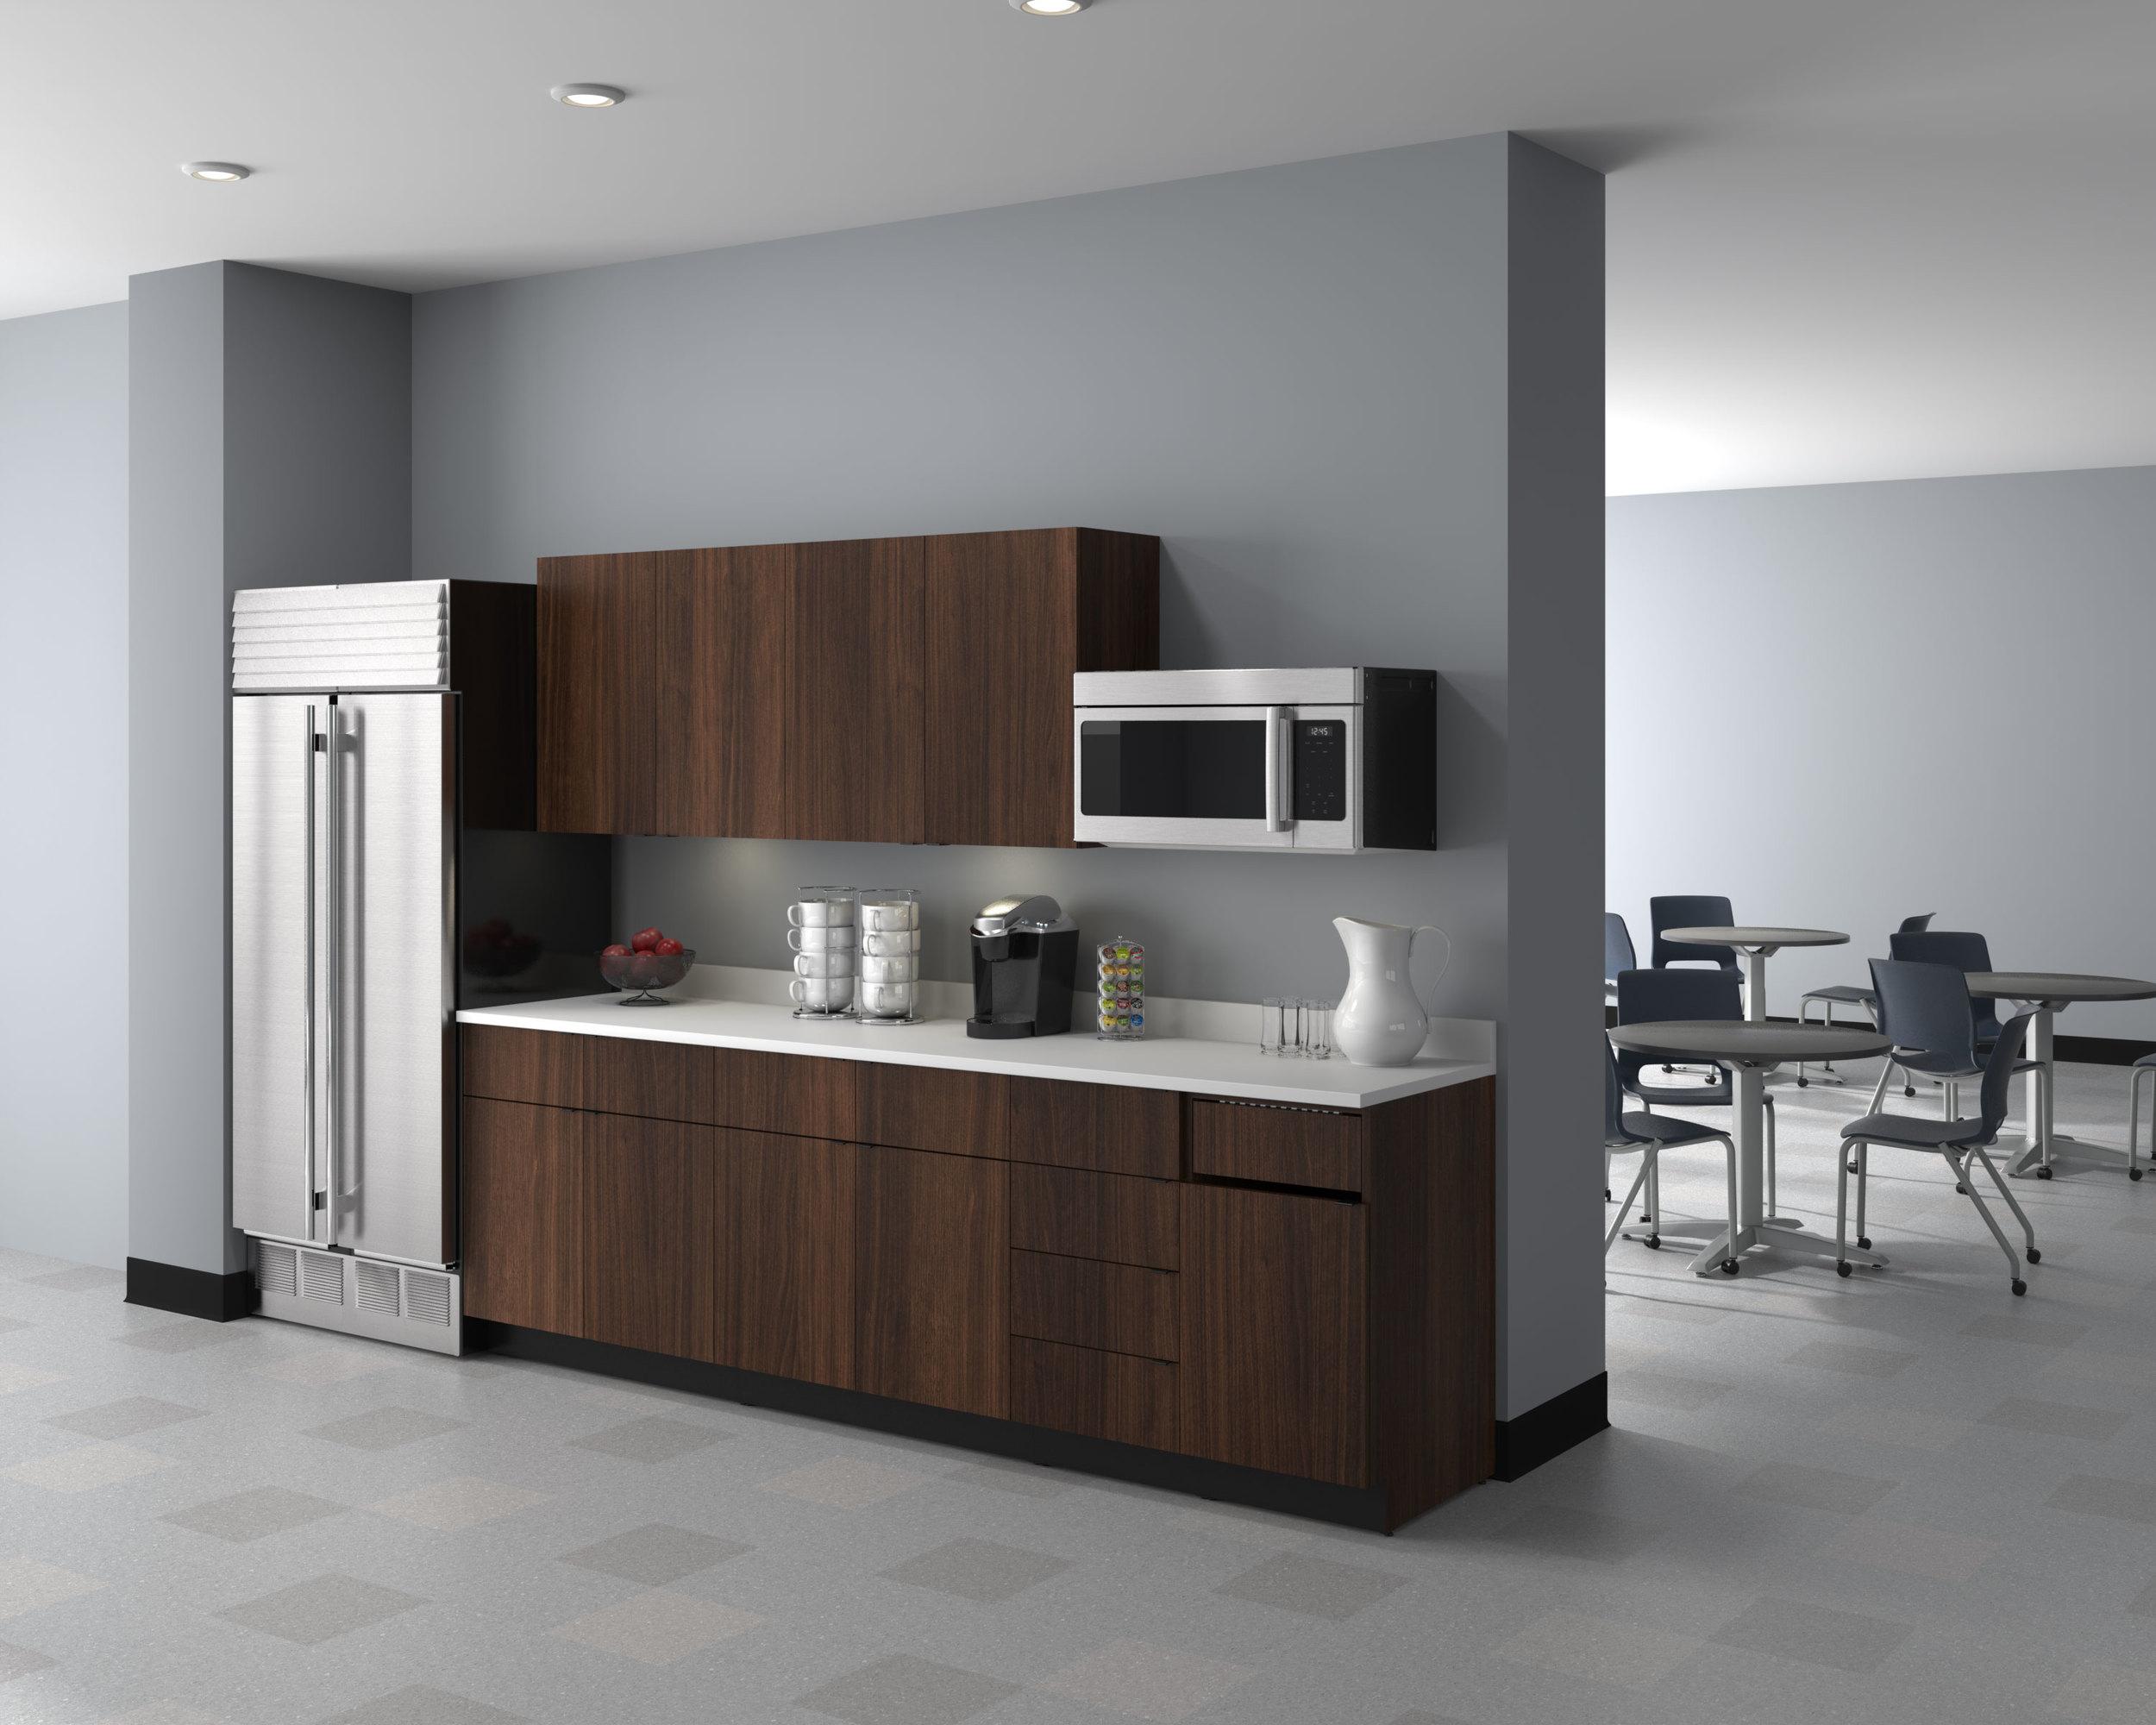 professional cgi photo of kitchen